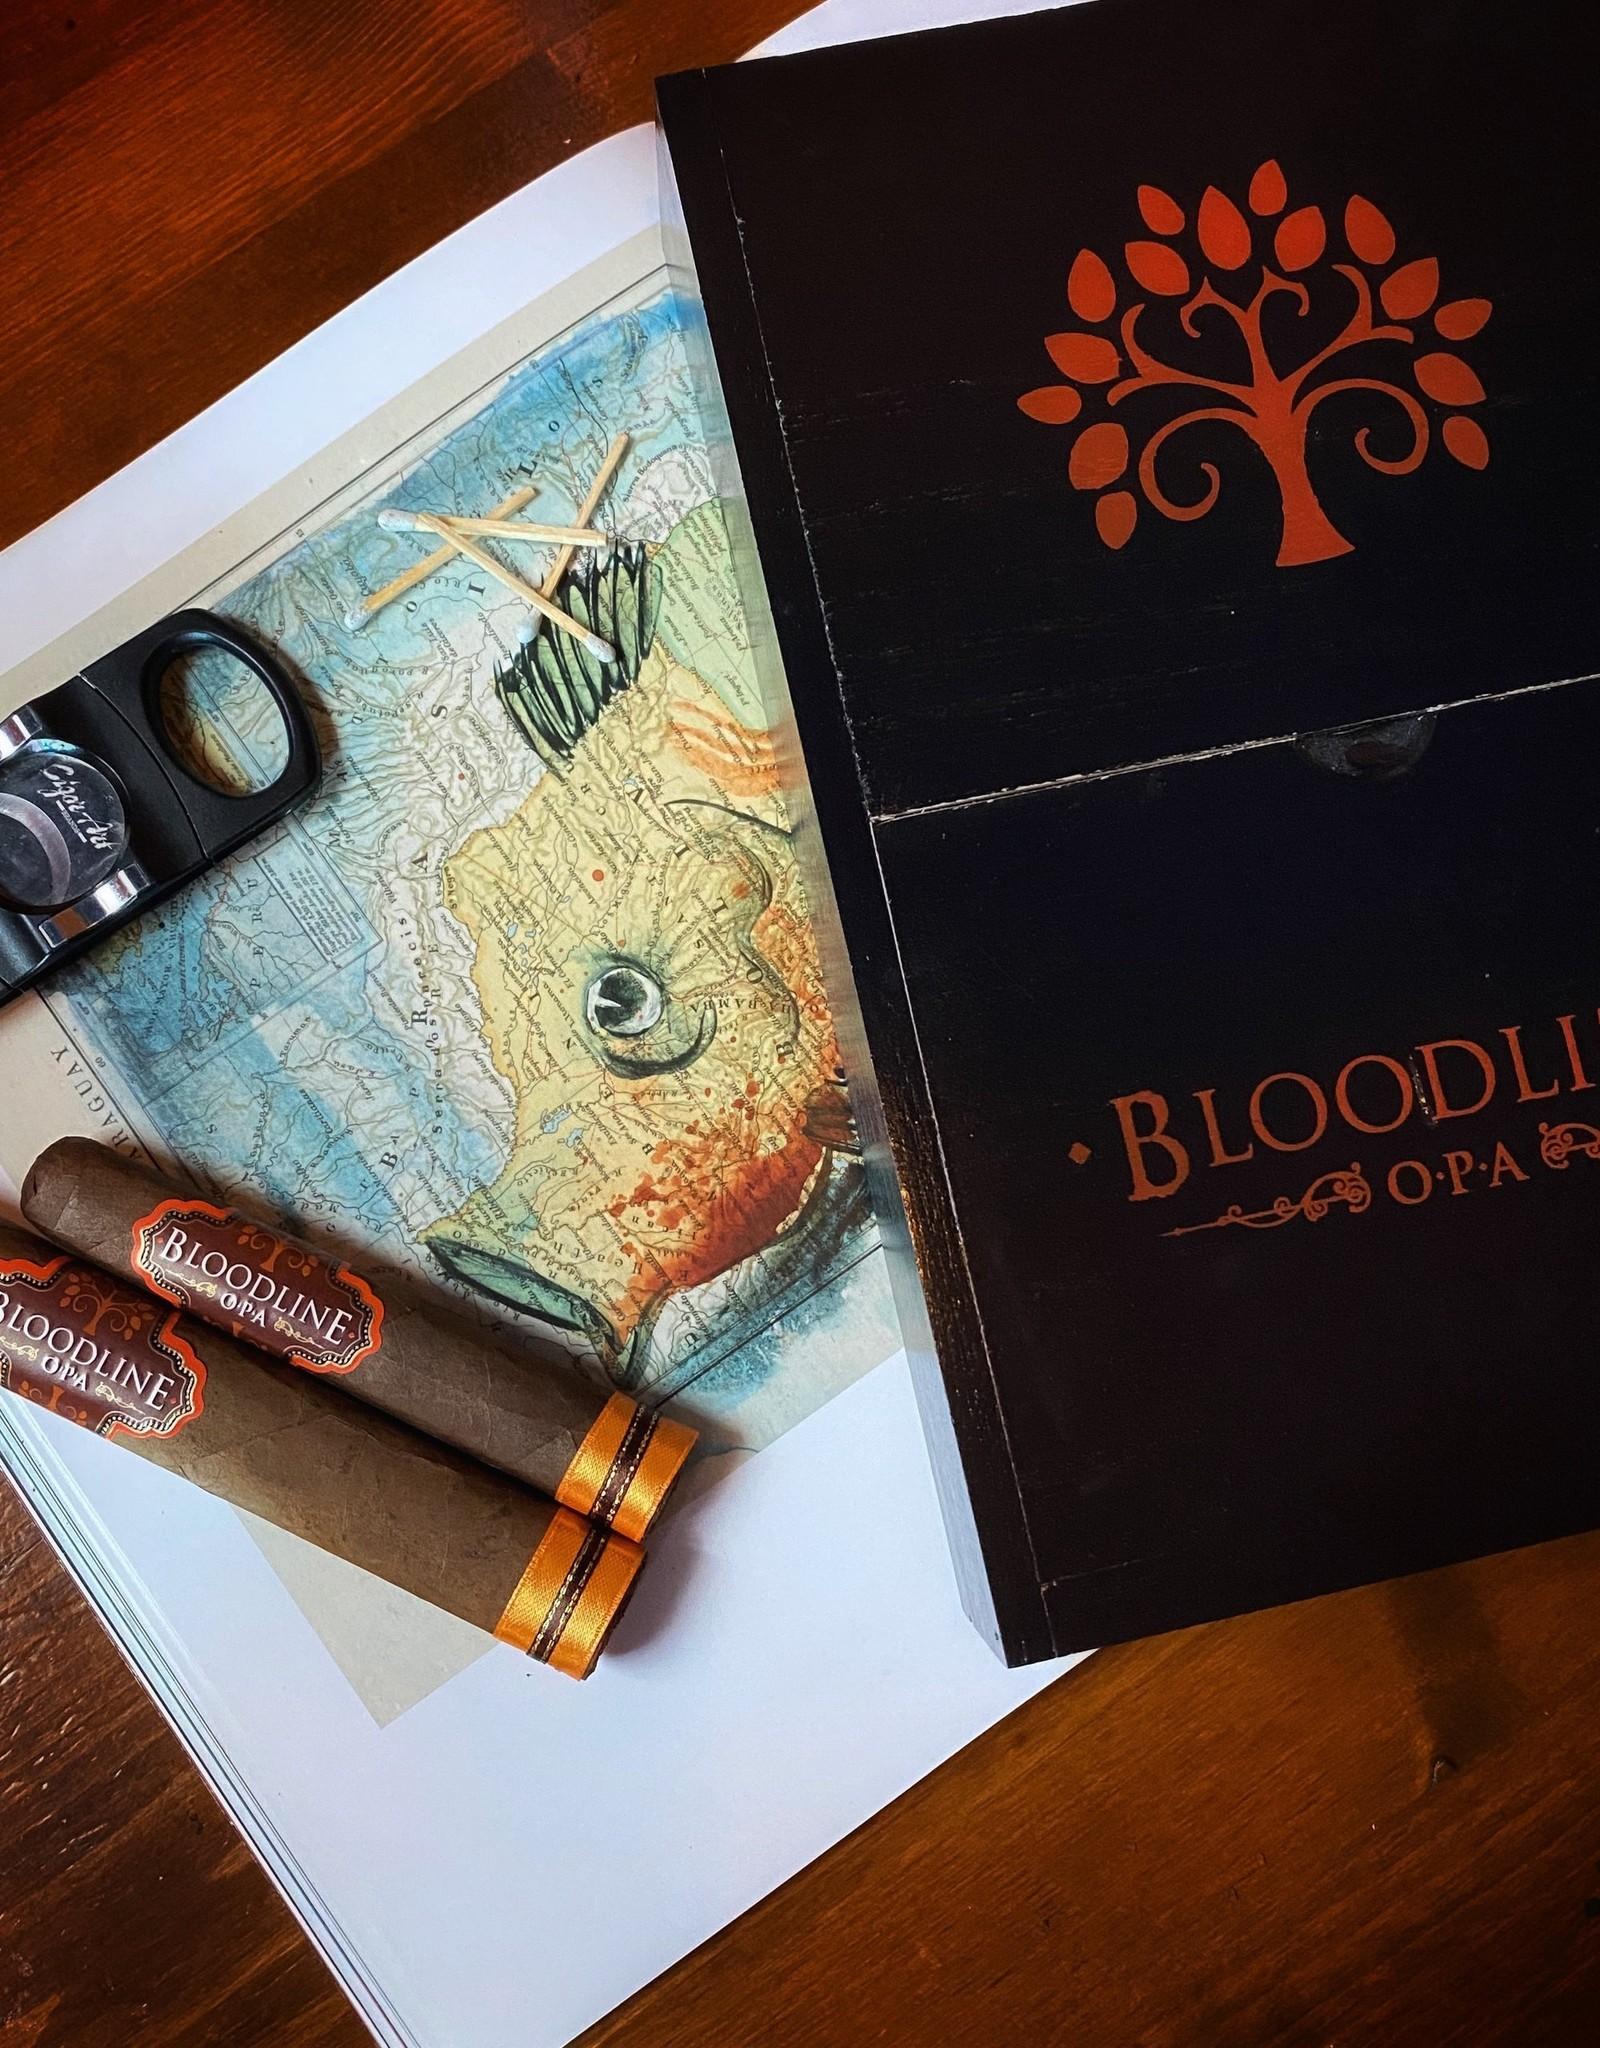 Bloodline OPA Bloodline OPA Habano Robusto 5 x 50 Five Pack